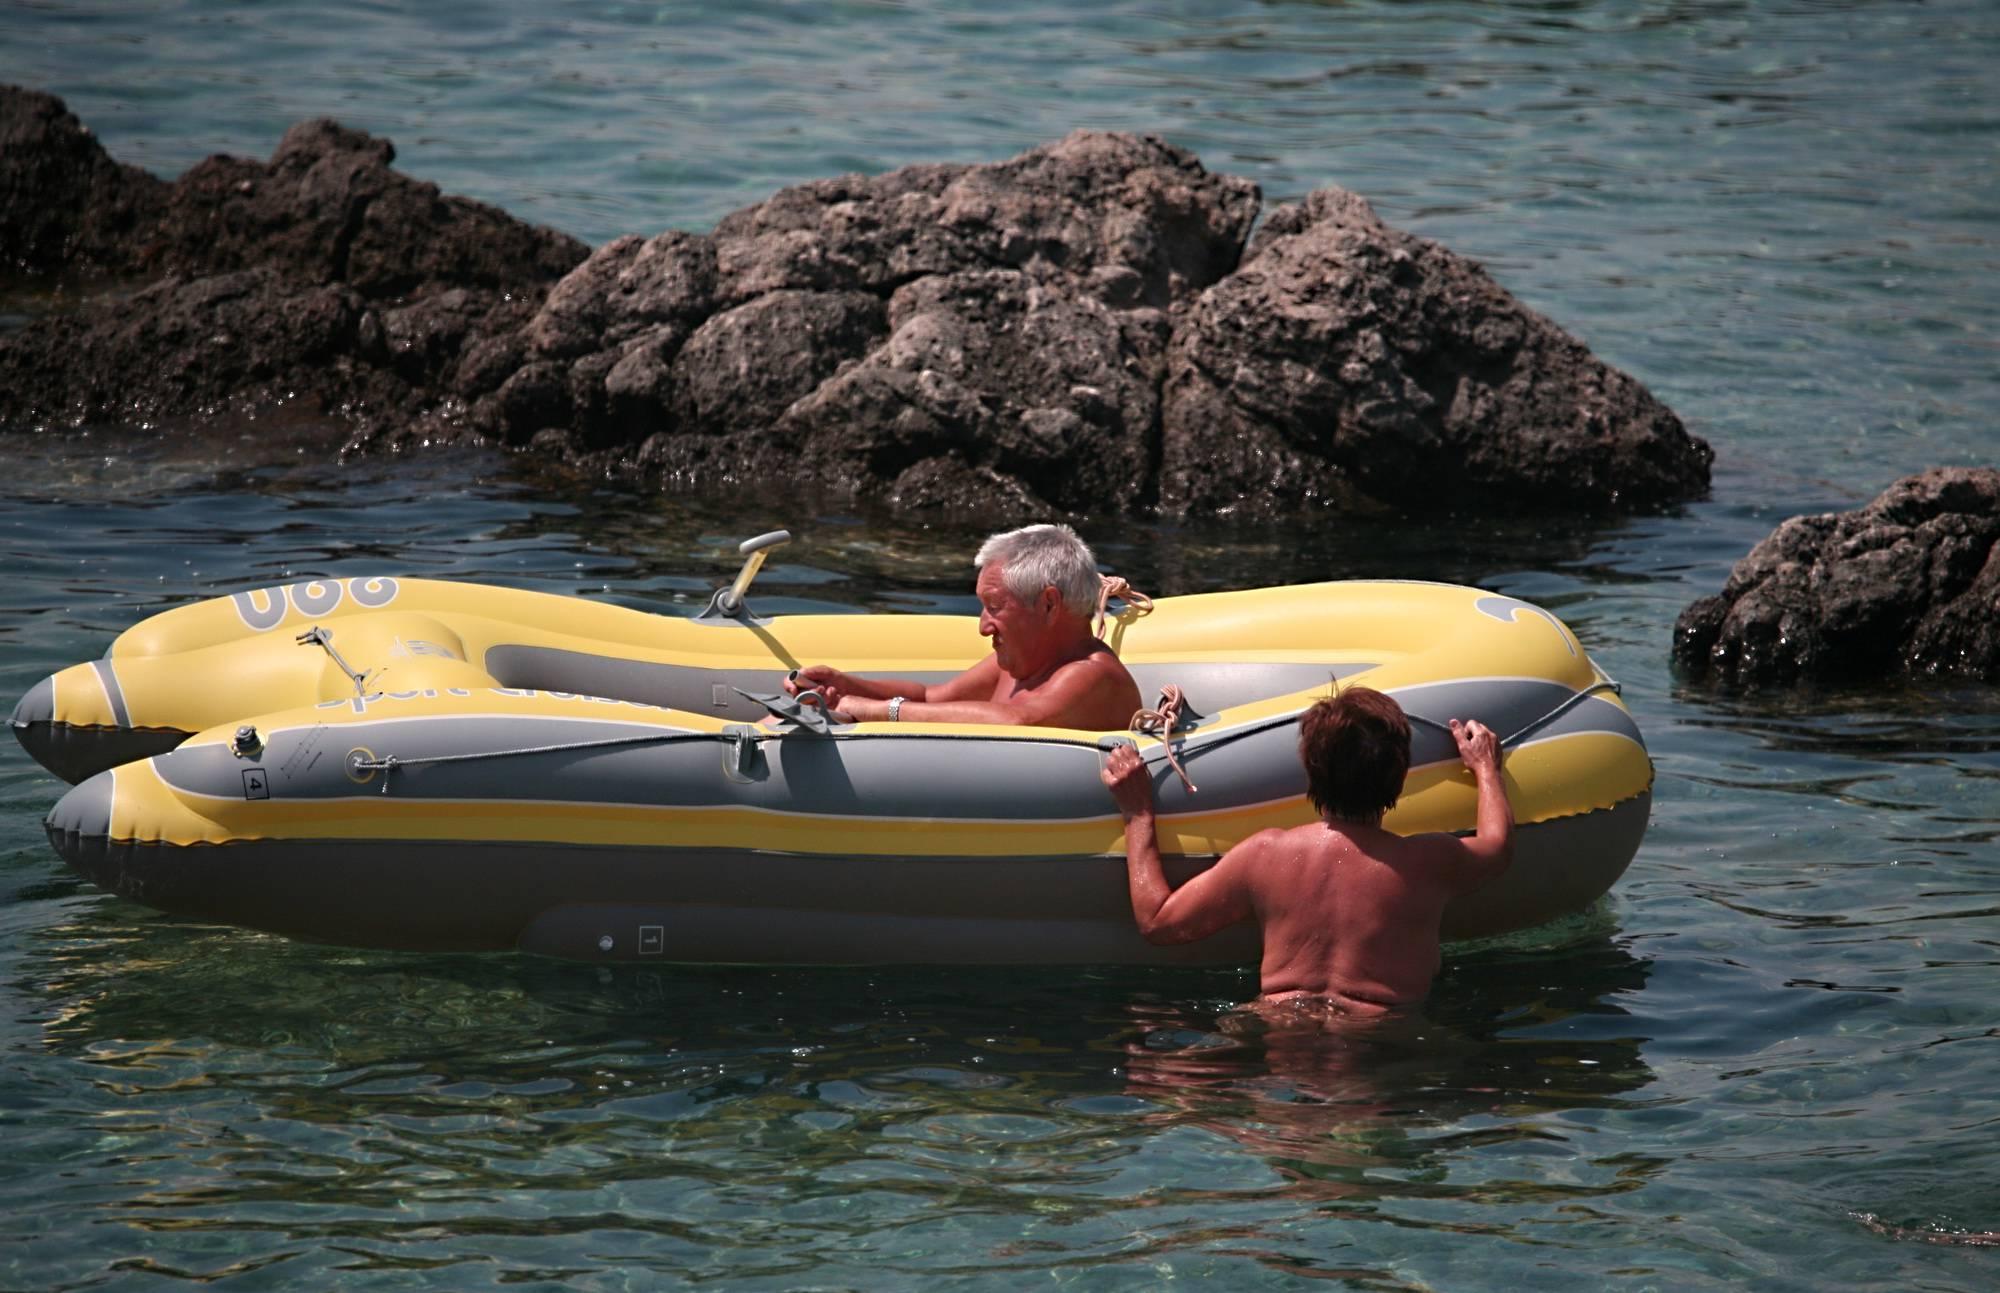 Lone Nudist in Yellow Boat - 1